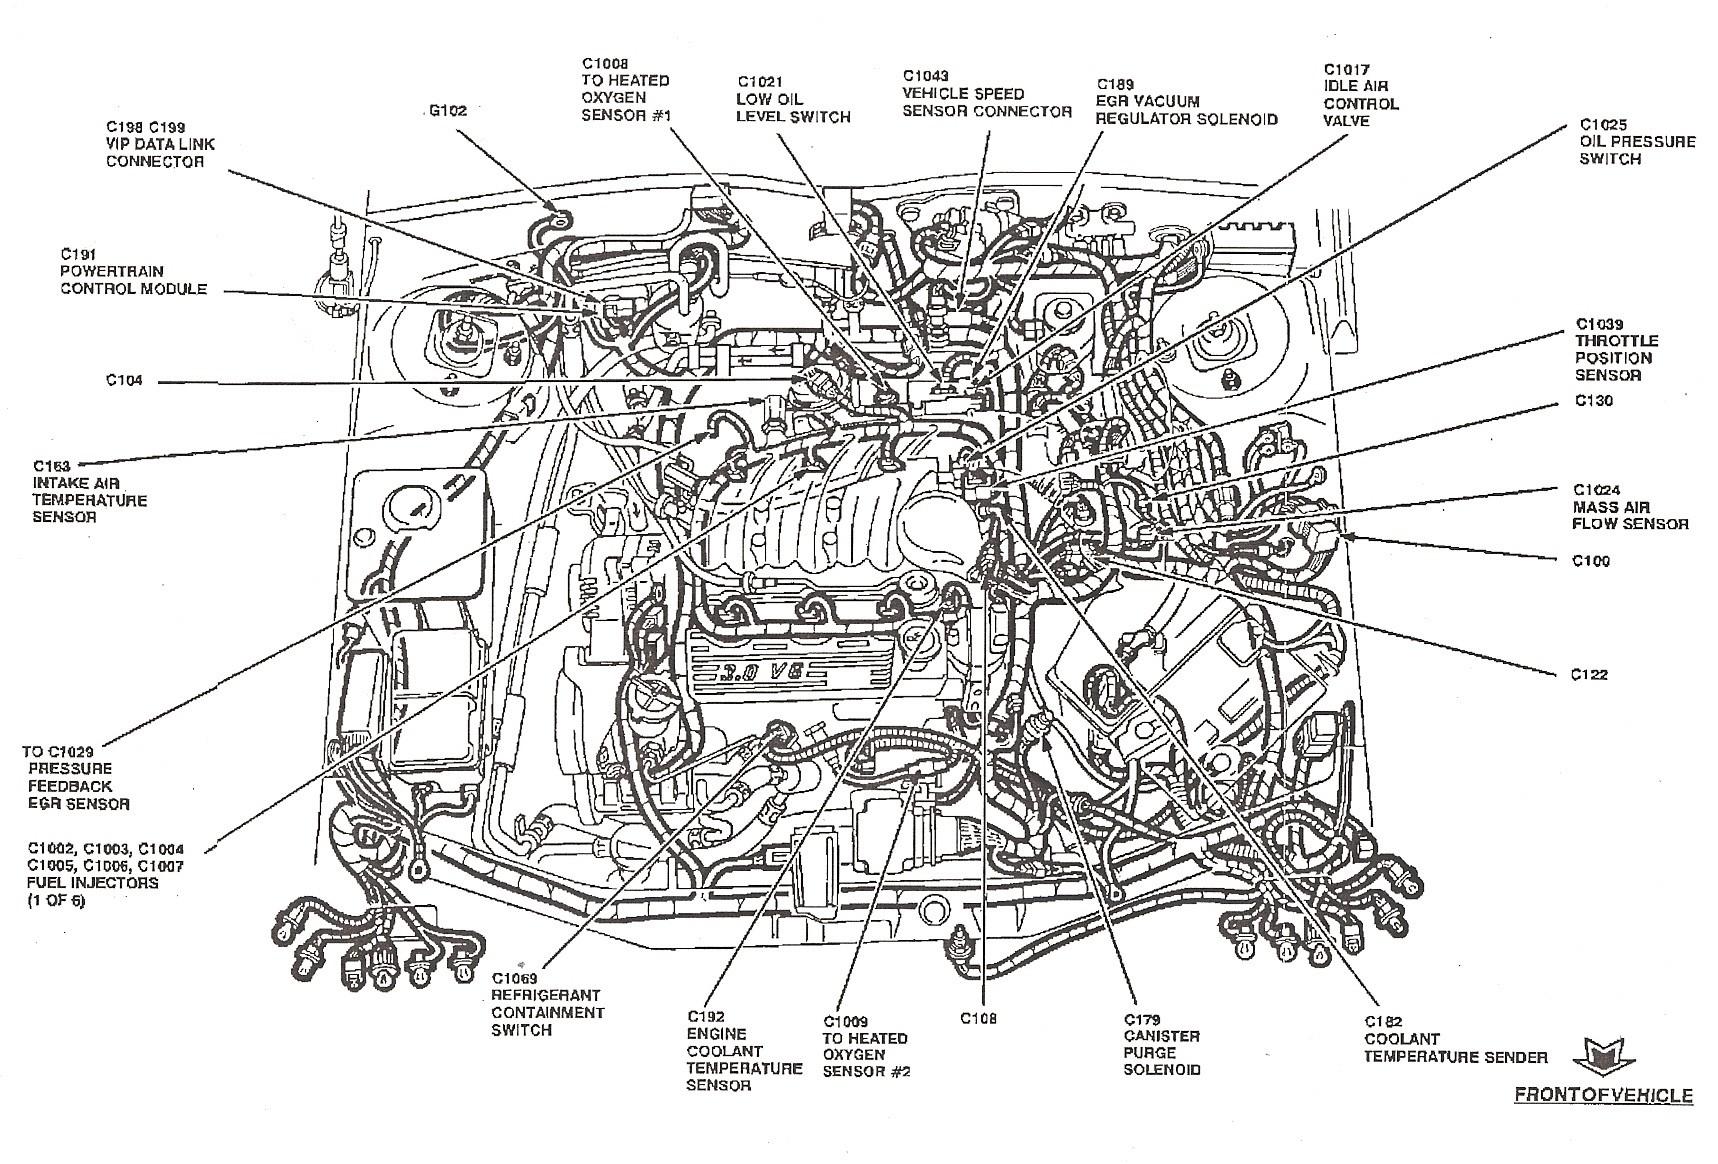 Engin Diagram 2005 ford Escape 1992 Escape Engine Diagram Wiring Diagrams Post Studio A Of Engin Diagram 2005 ford Escape